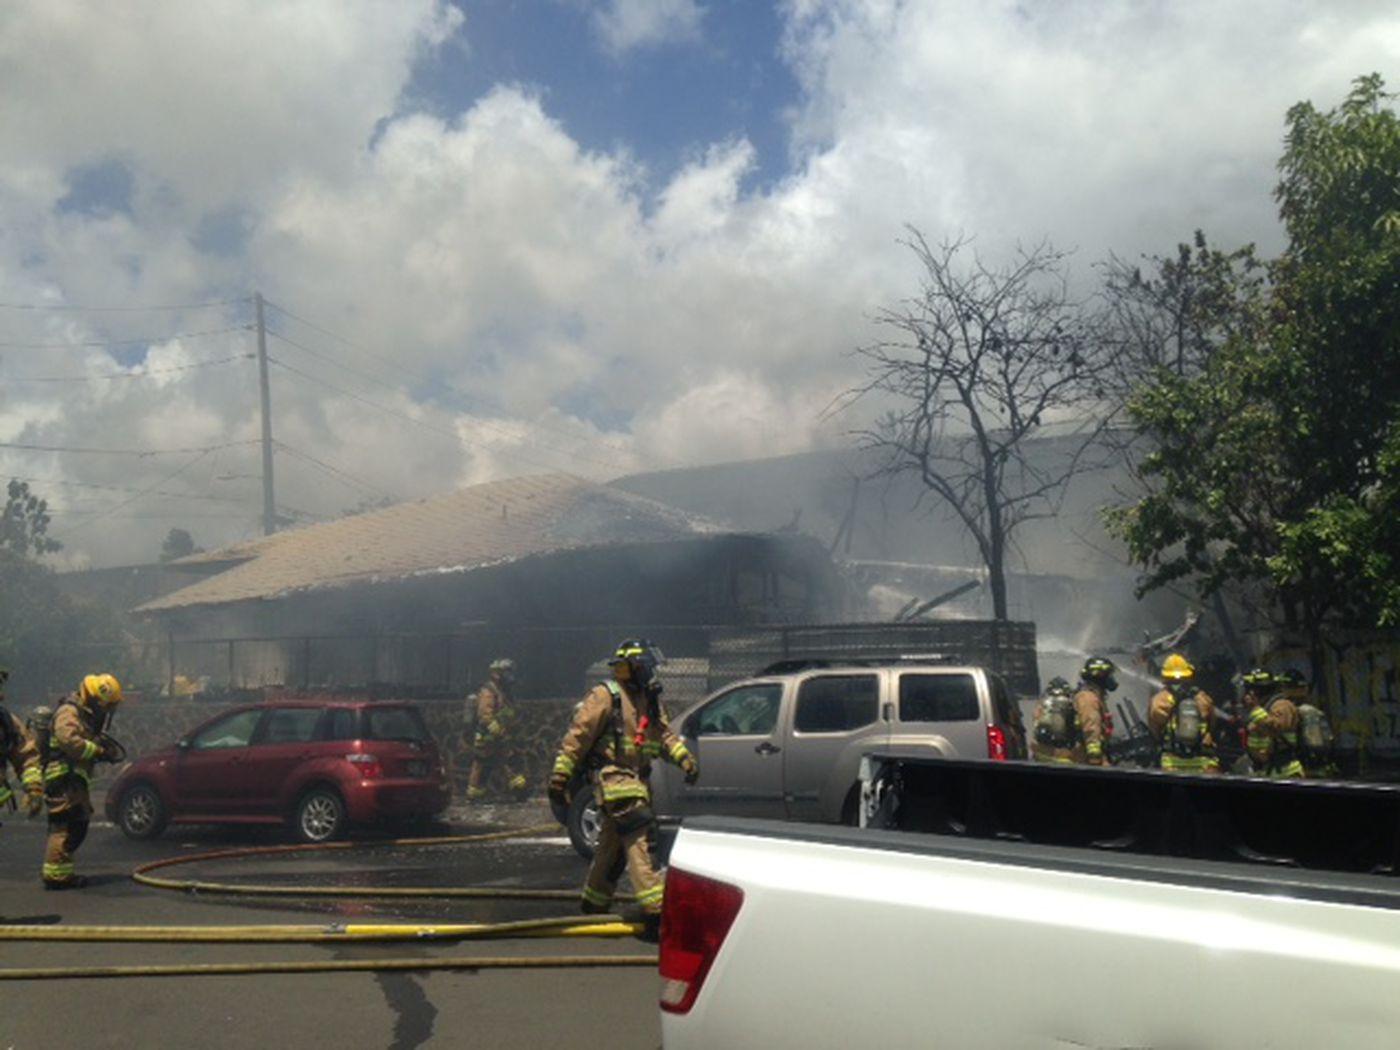 Large 2 alarm blaze destroys Kalihi home 1400x1050